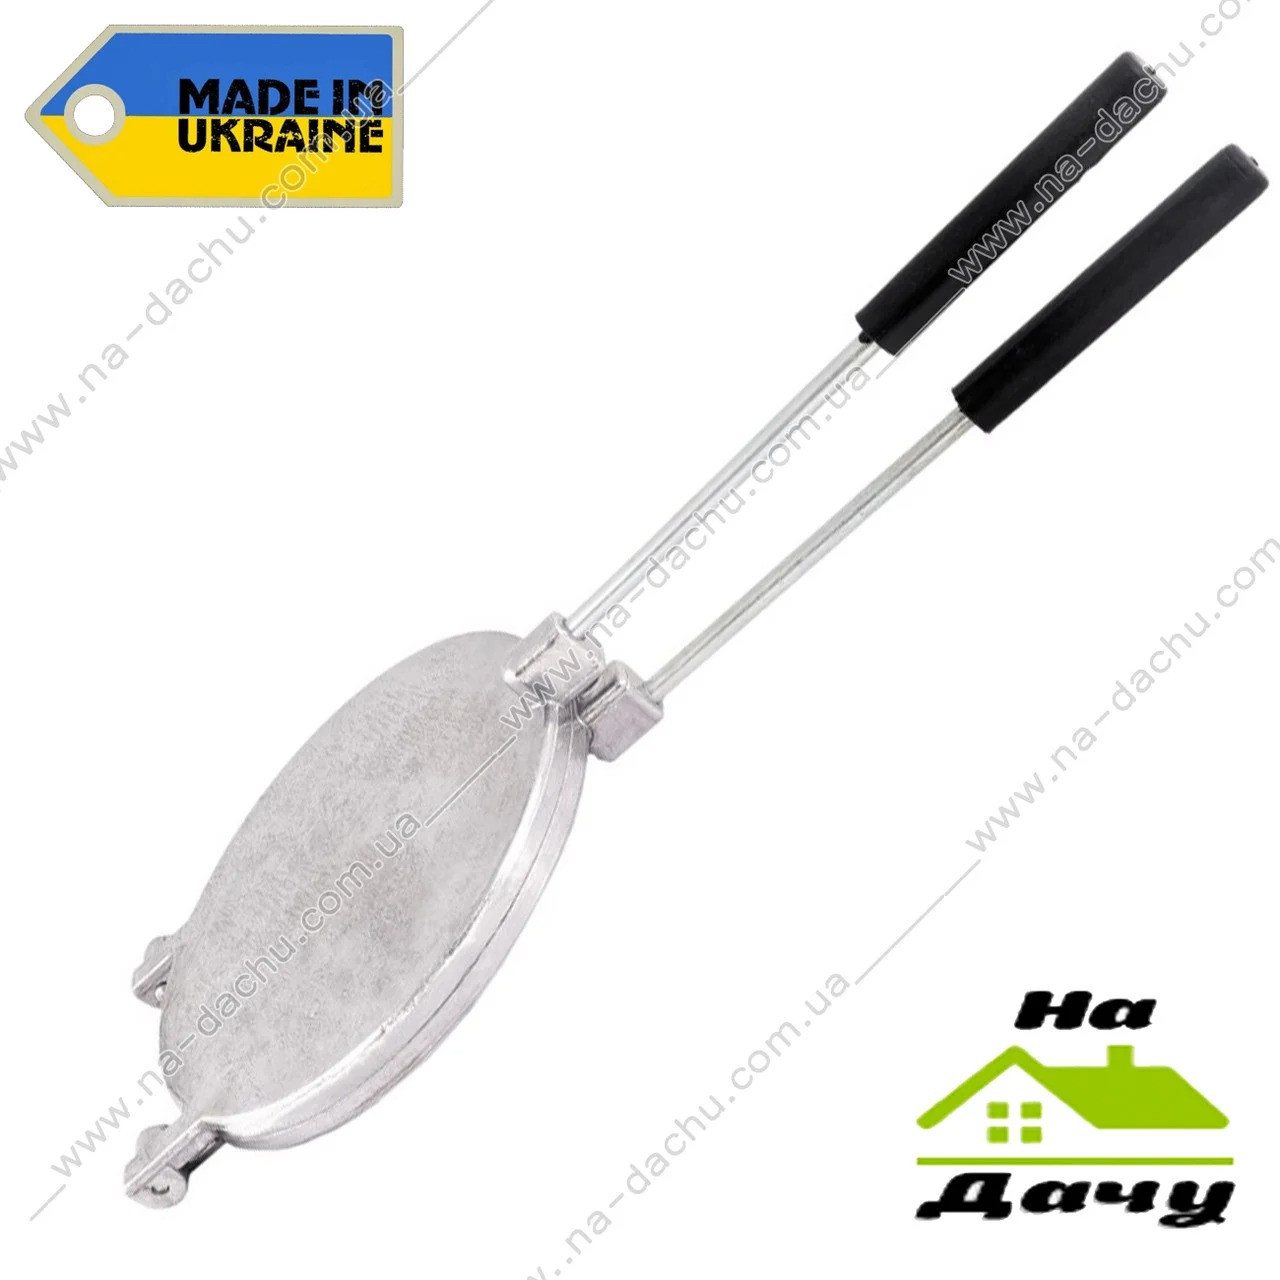 Форма для вафель круглая металлическая 220 мм, Господар 92-0843